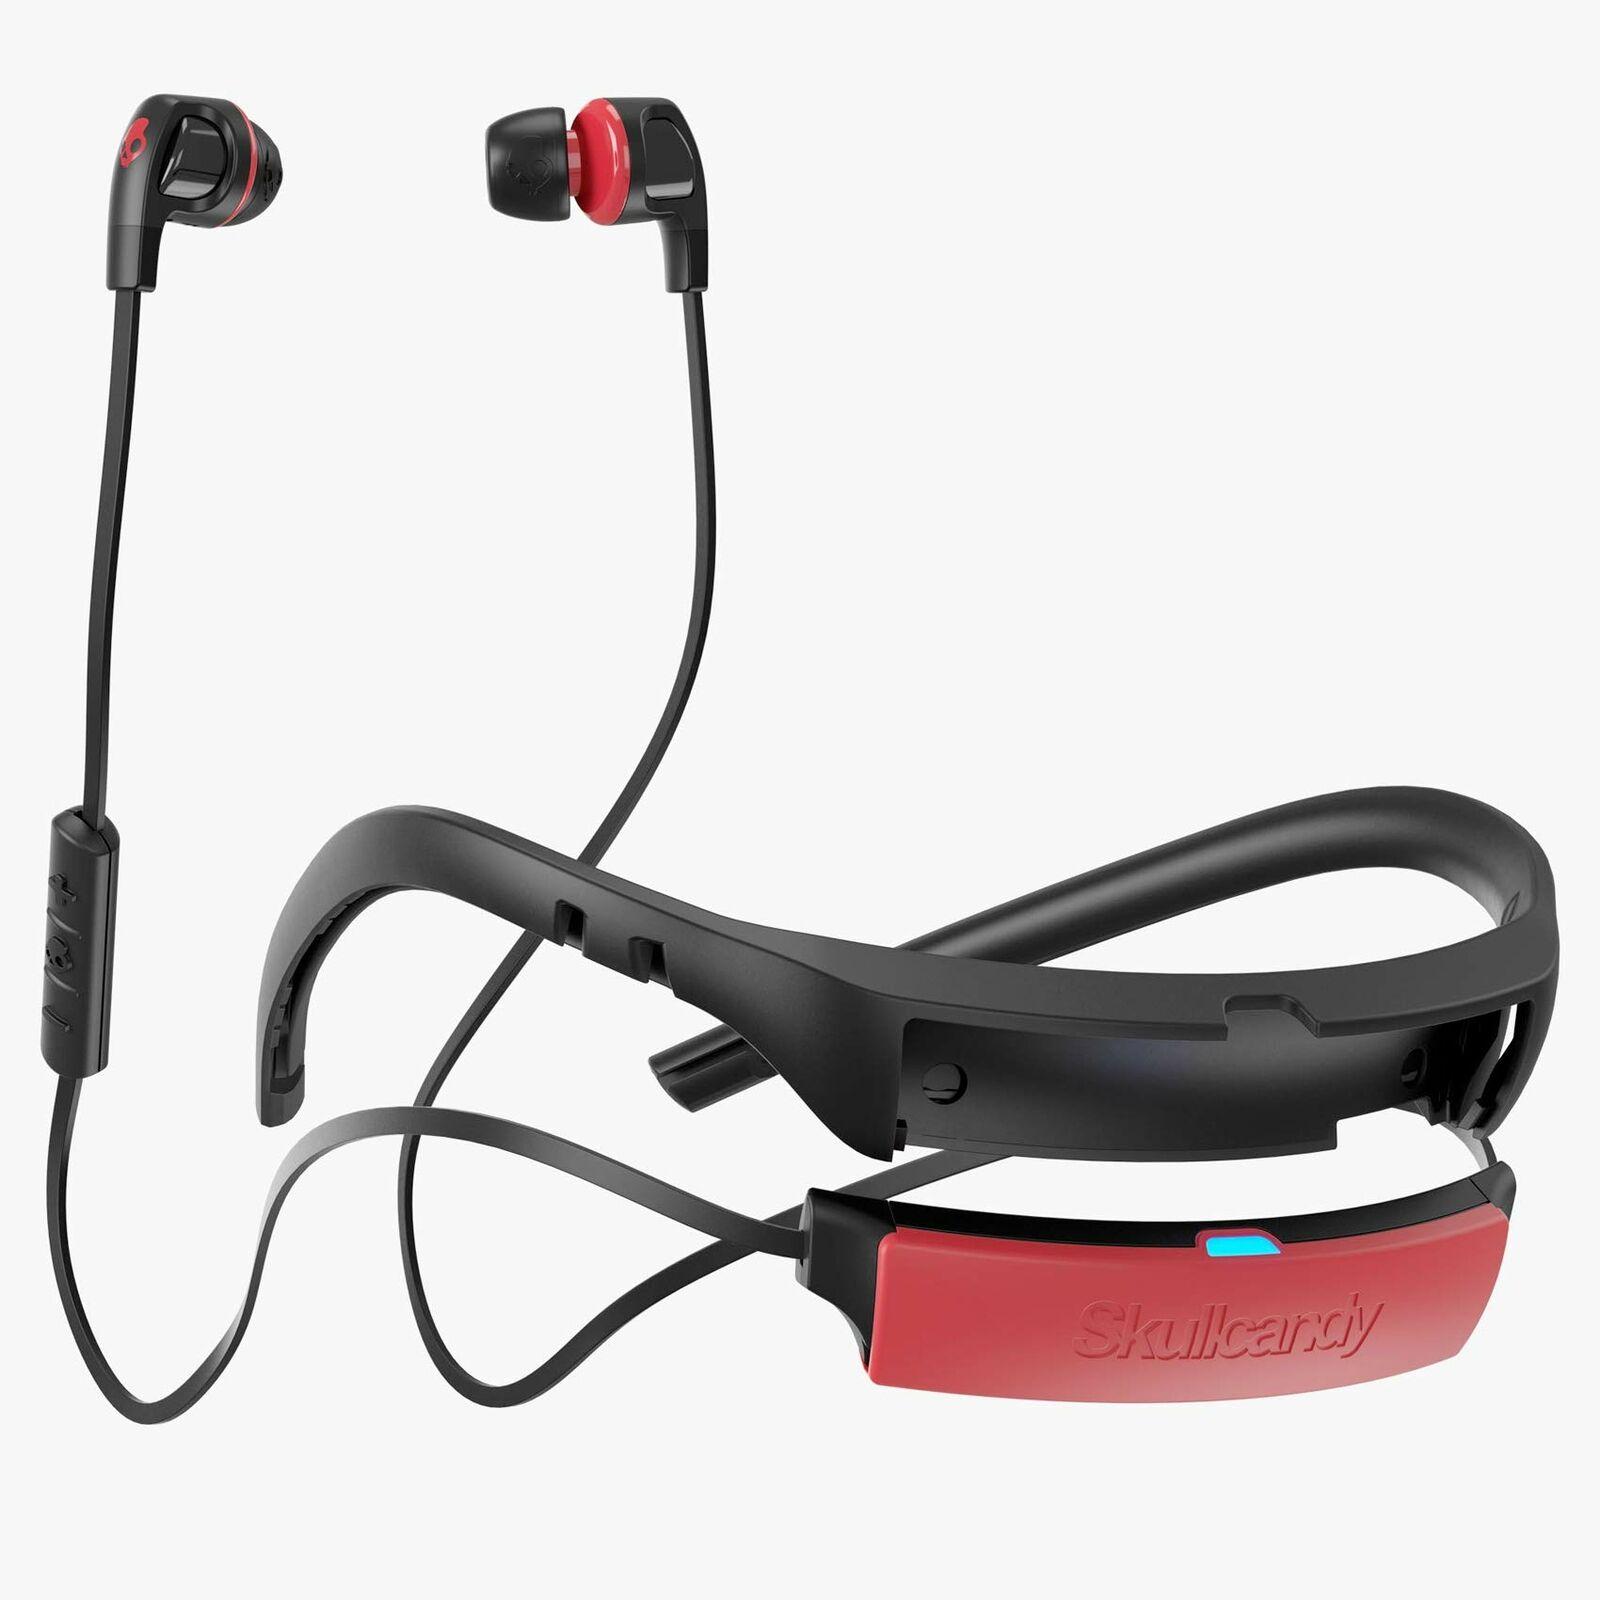 Skullcandy Smokin Buds 2 in-Ear Bluetooth Wireless Earbuds Microphone Black/Red